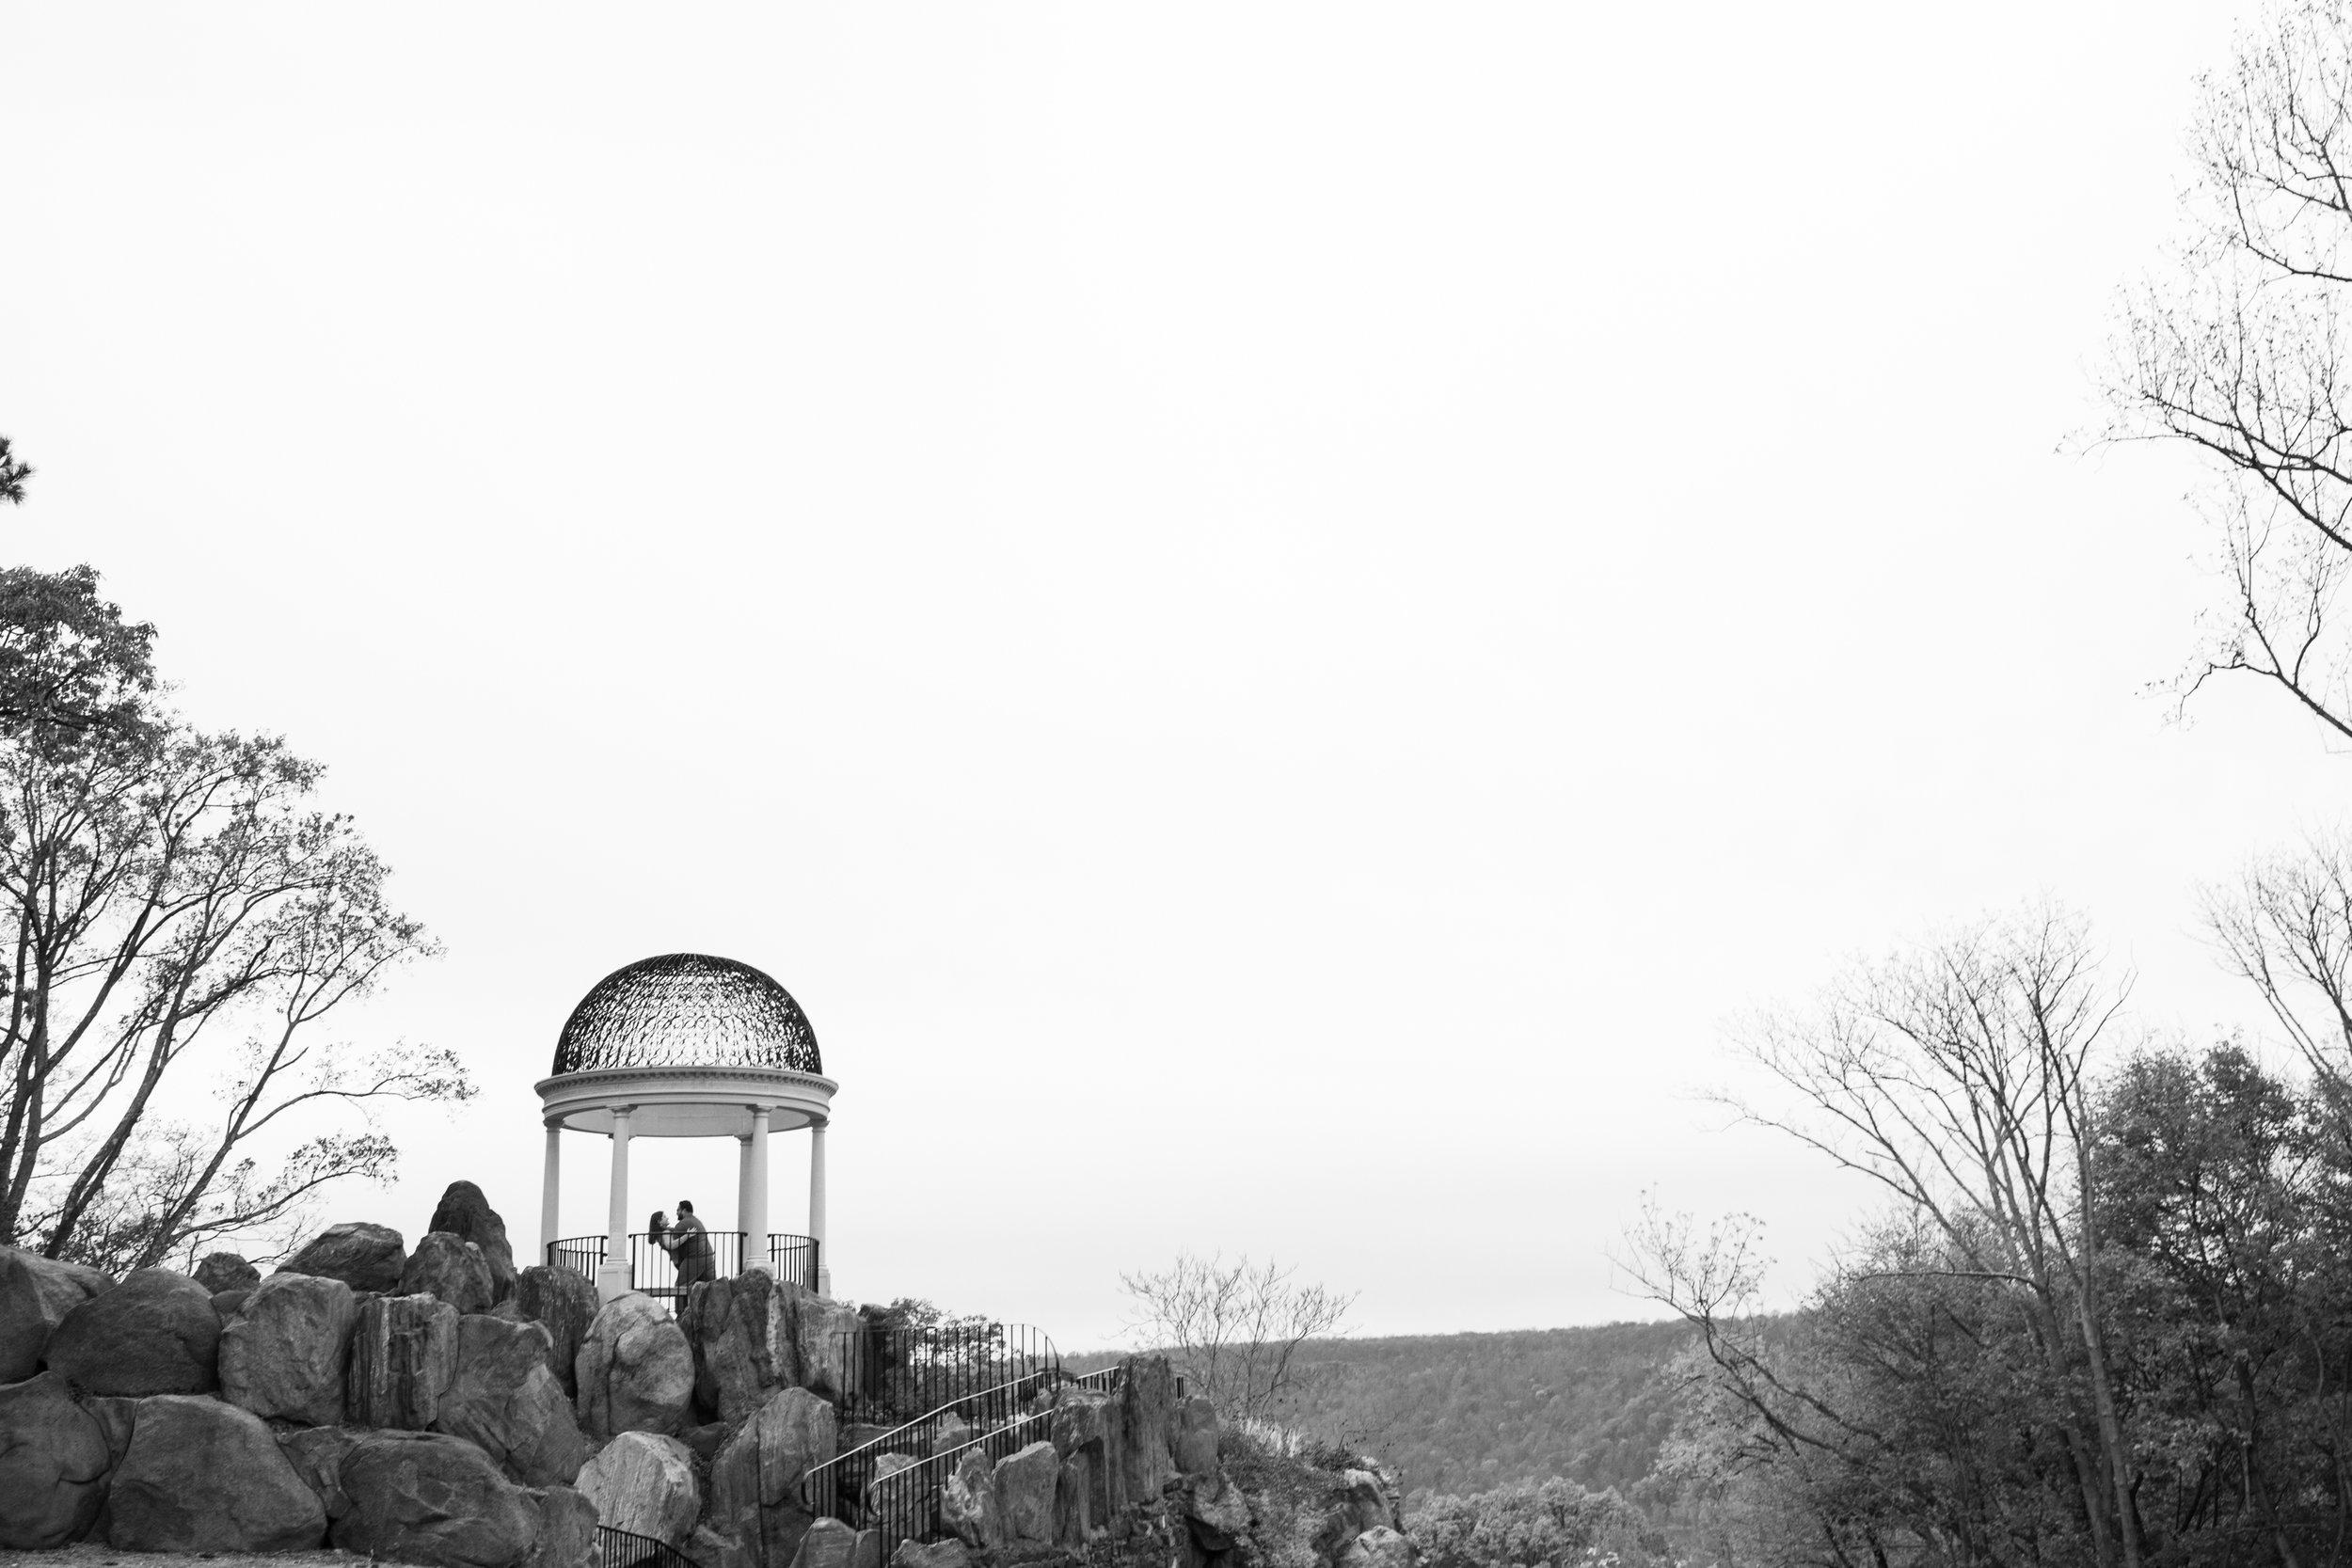 New York Wedding Photographers Engagement Session at Untermeyer Garden-2.jpg